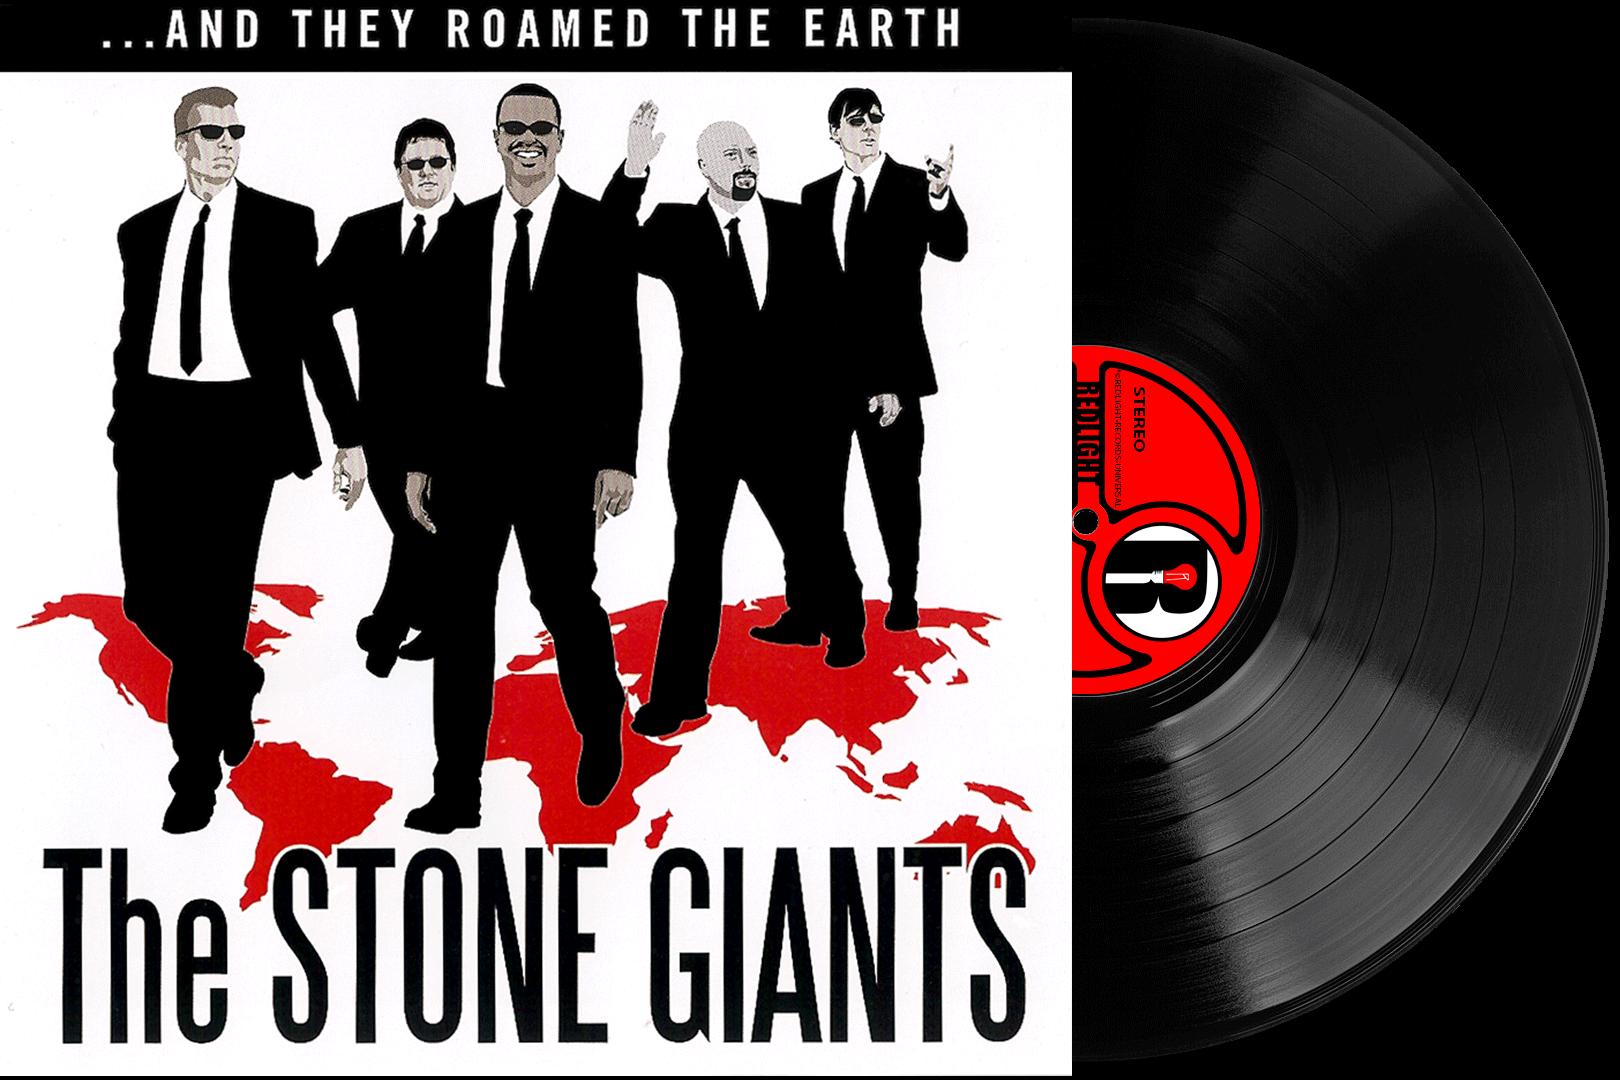 Stone Giants Record aTRtE